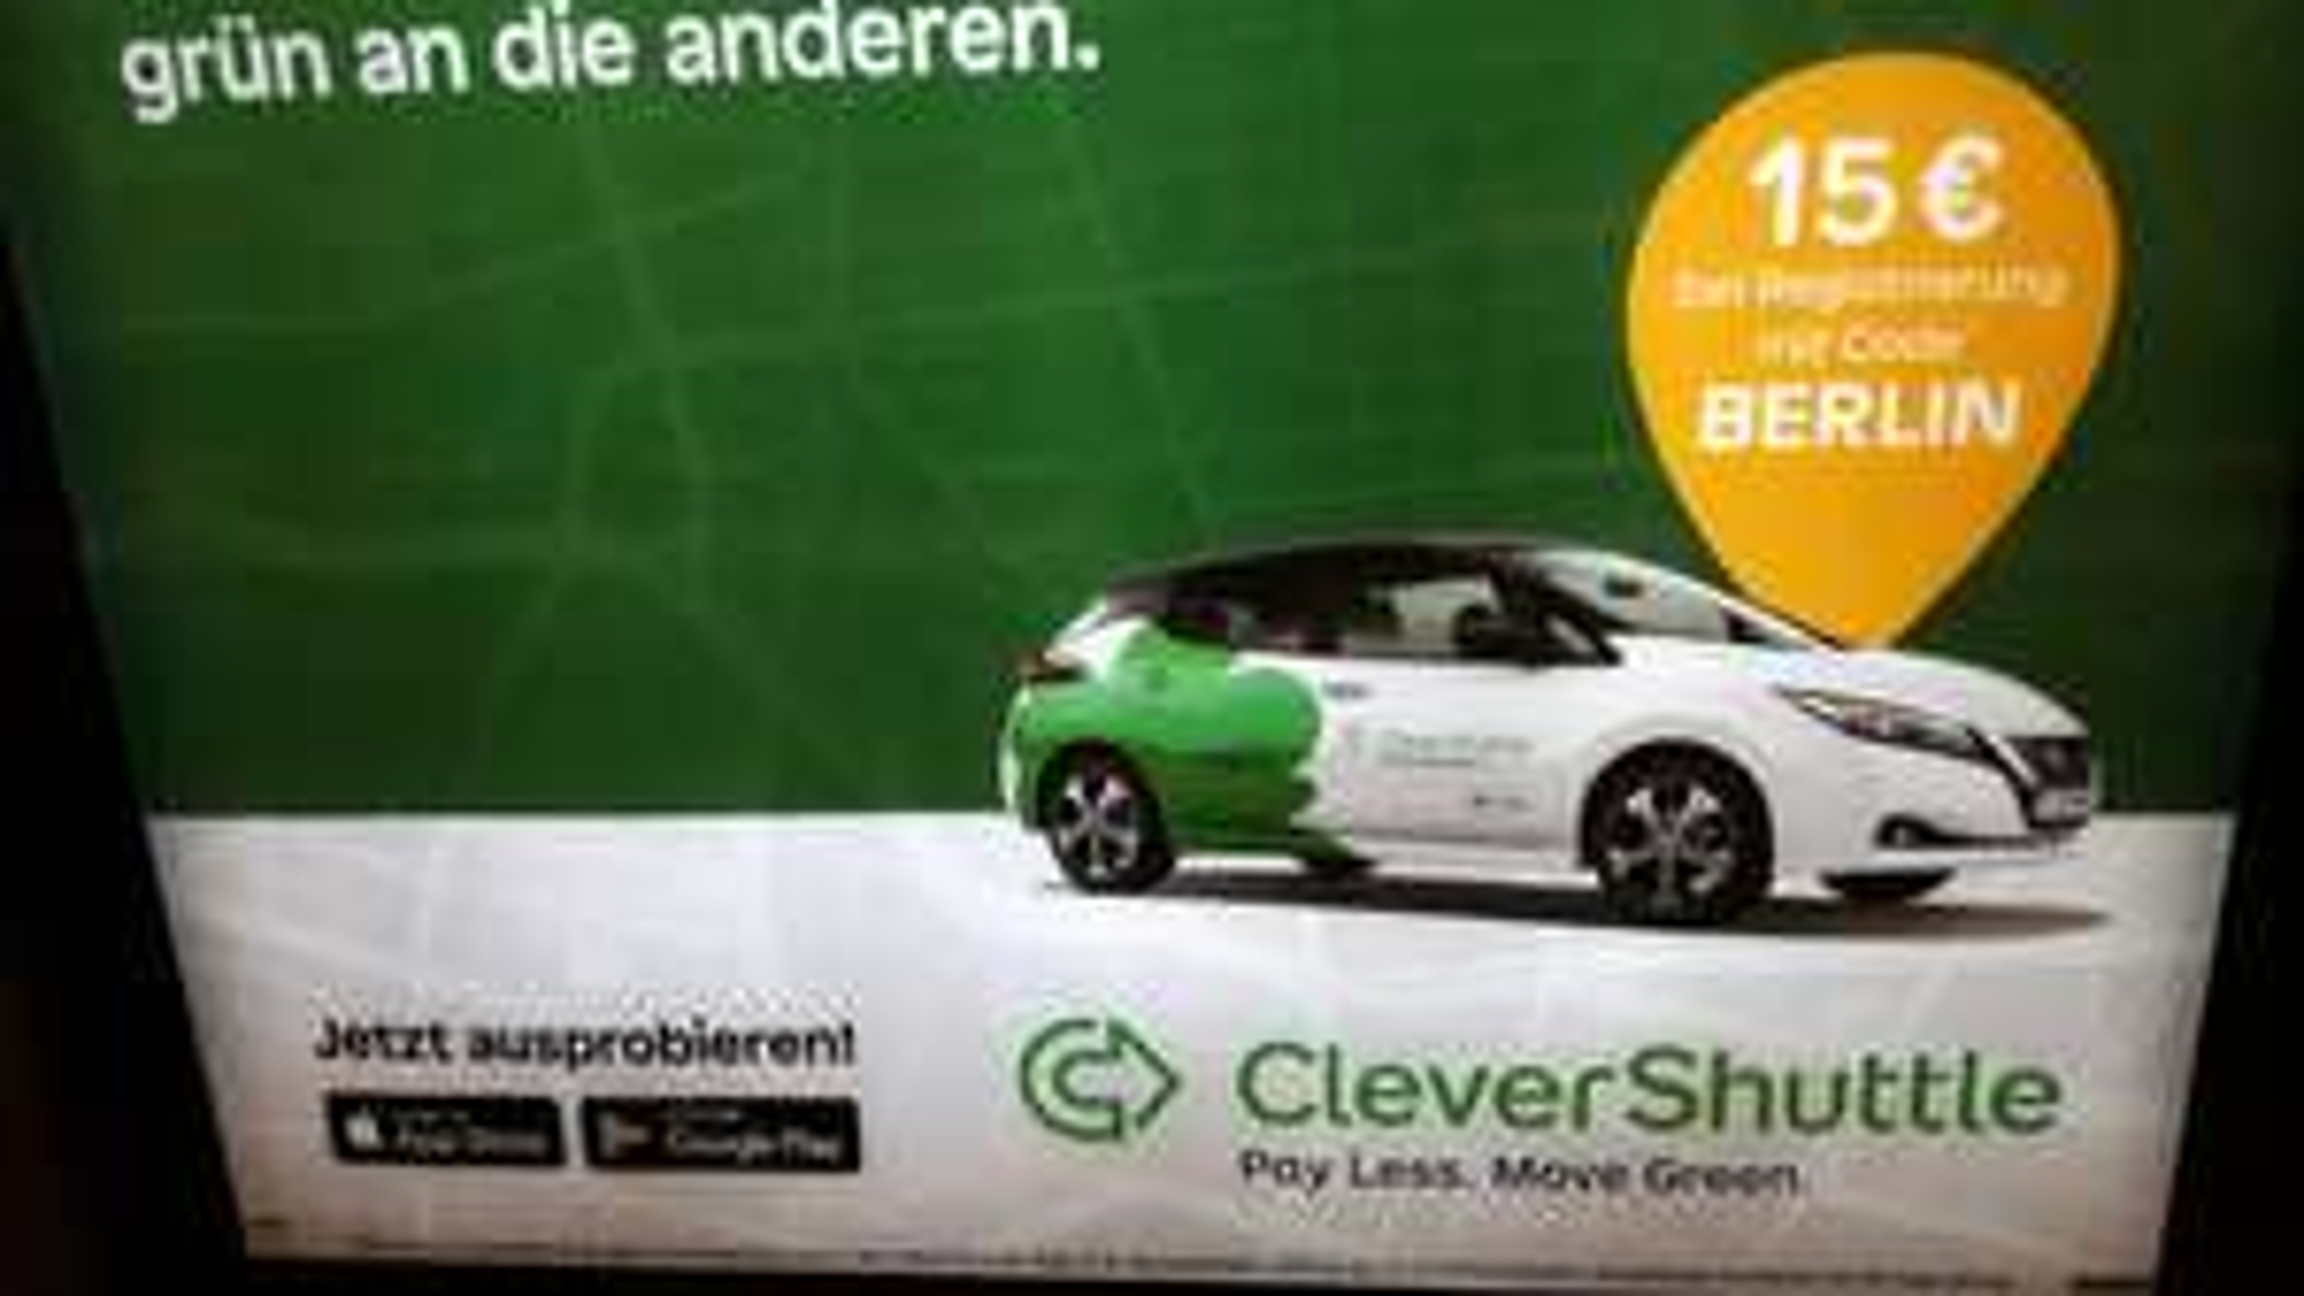 CleverShuttle - Berlin. Bei Registrierung 15€ Guthaben